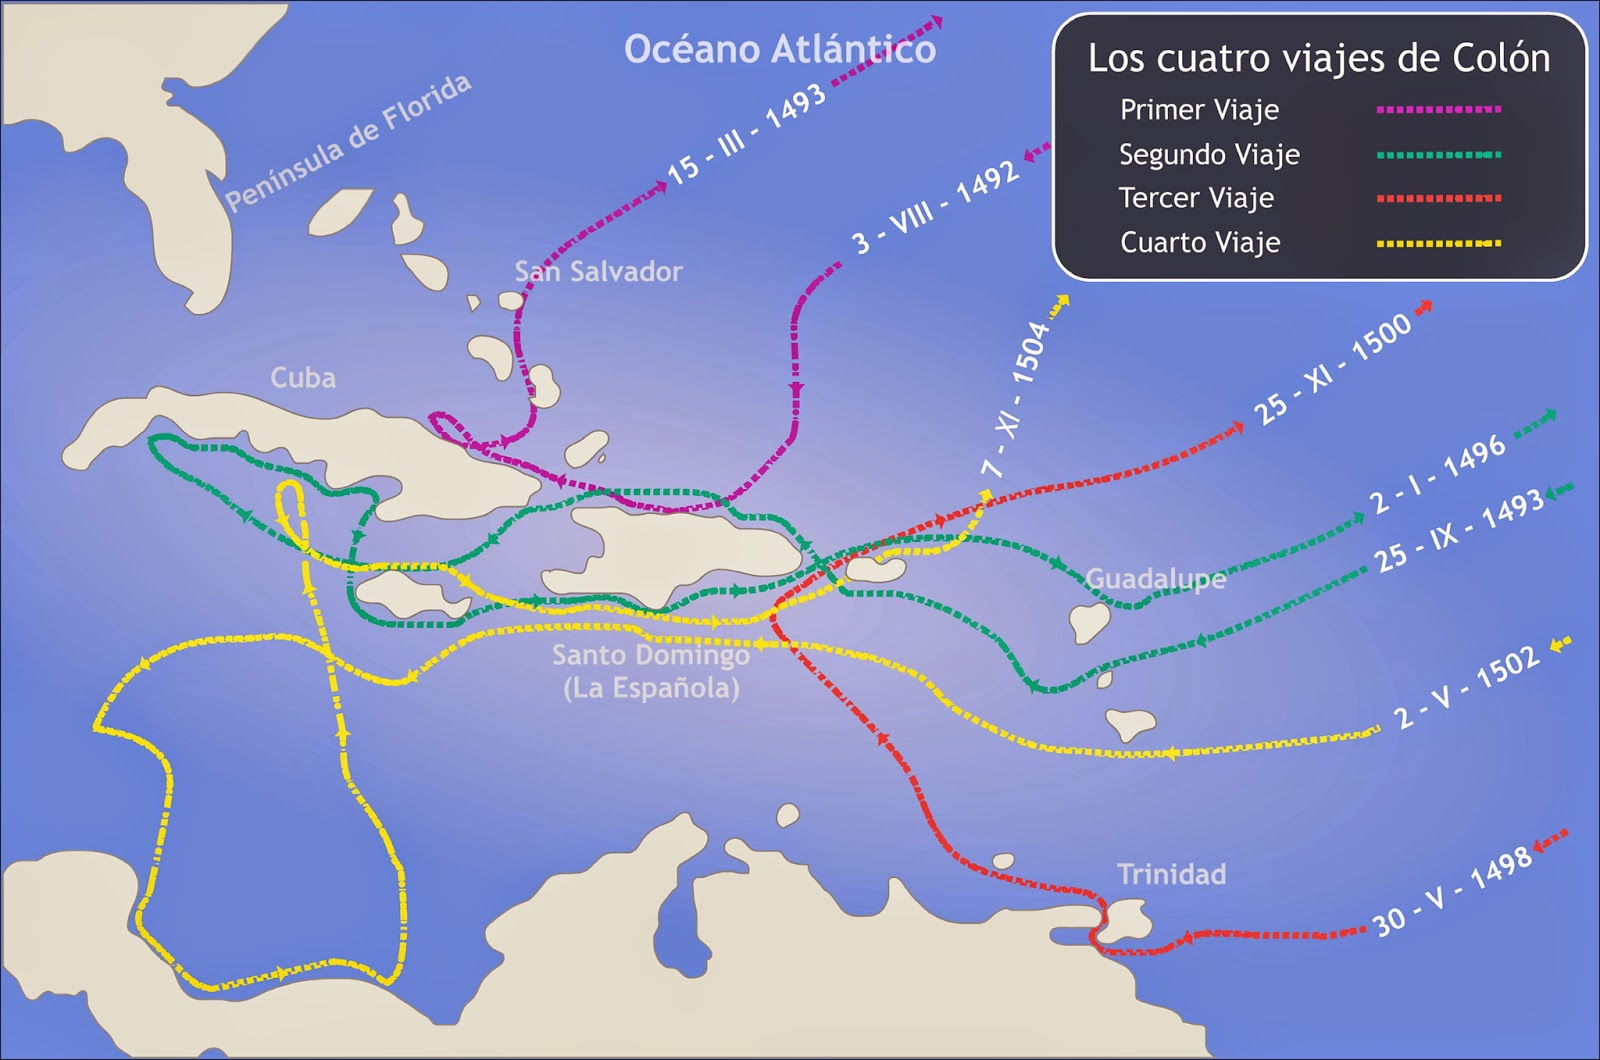 Mapa de los viajes de cristobal colon en america imagui for Cuarto viaje de cristobal colon